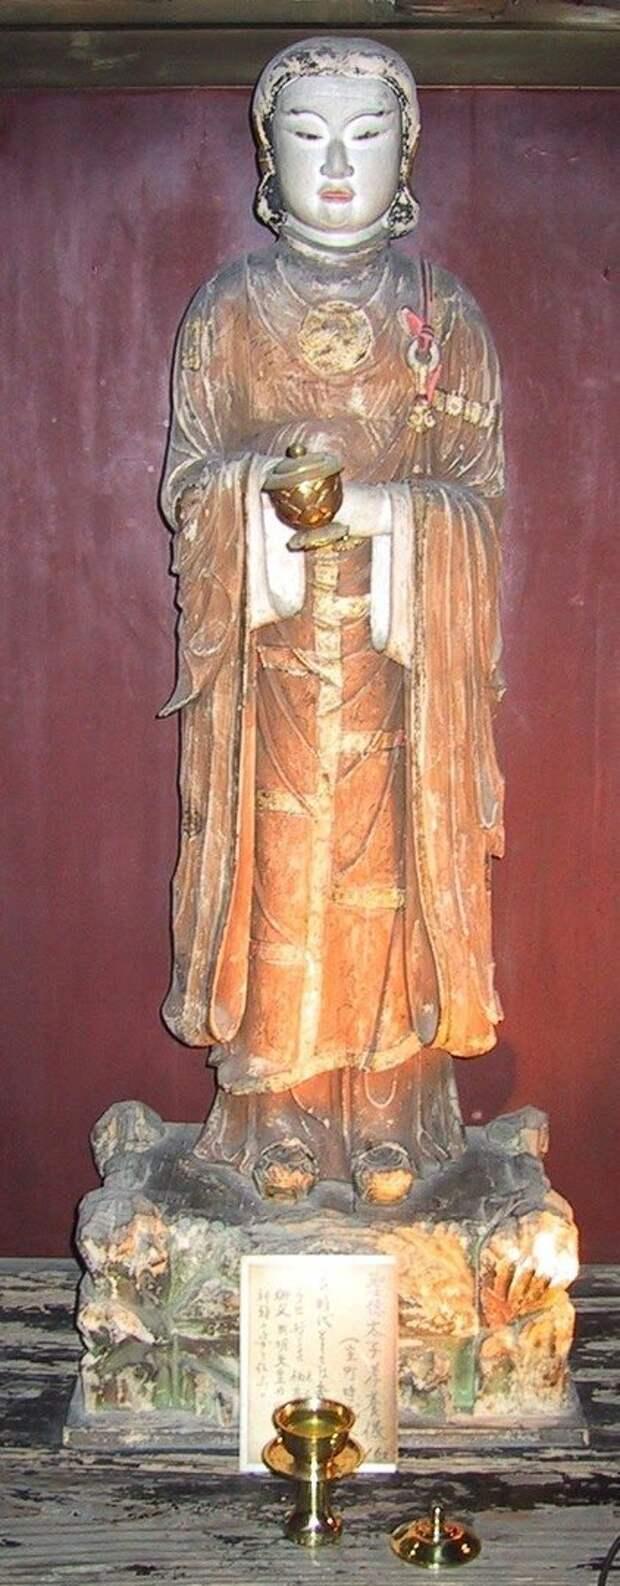 Деревянная скульптура принца Сётоку в храме Асука-дэра.